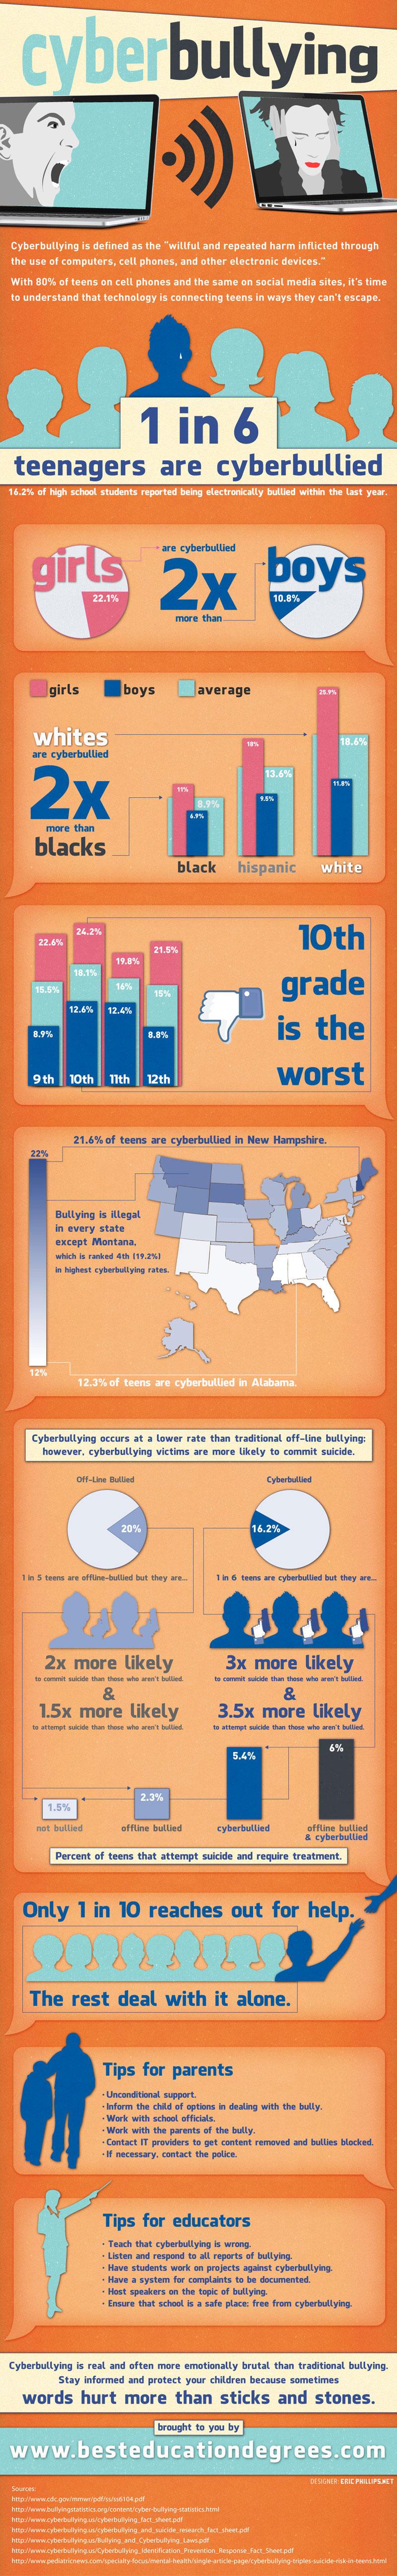 Teenage Cyber Bullying Statistics-Infographic